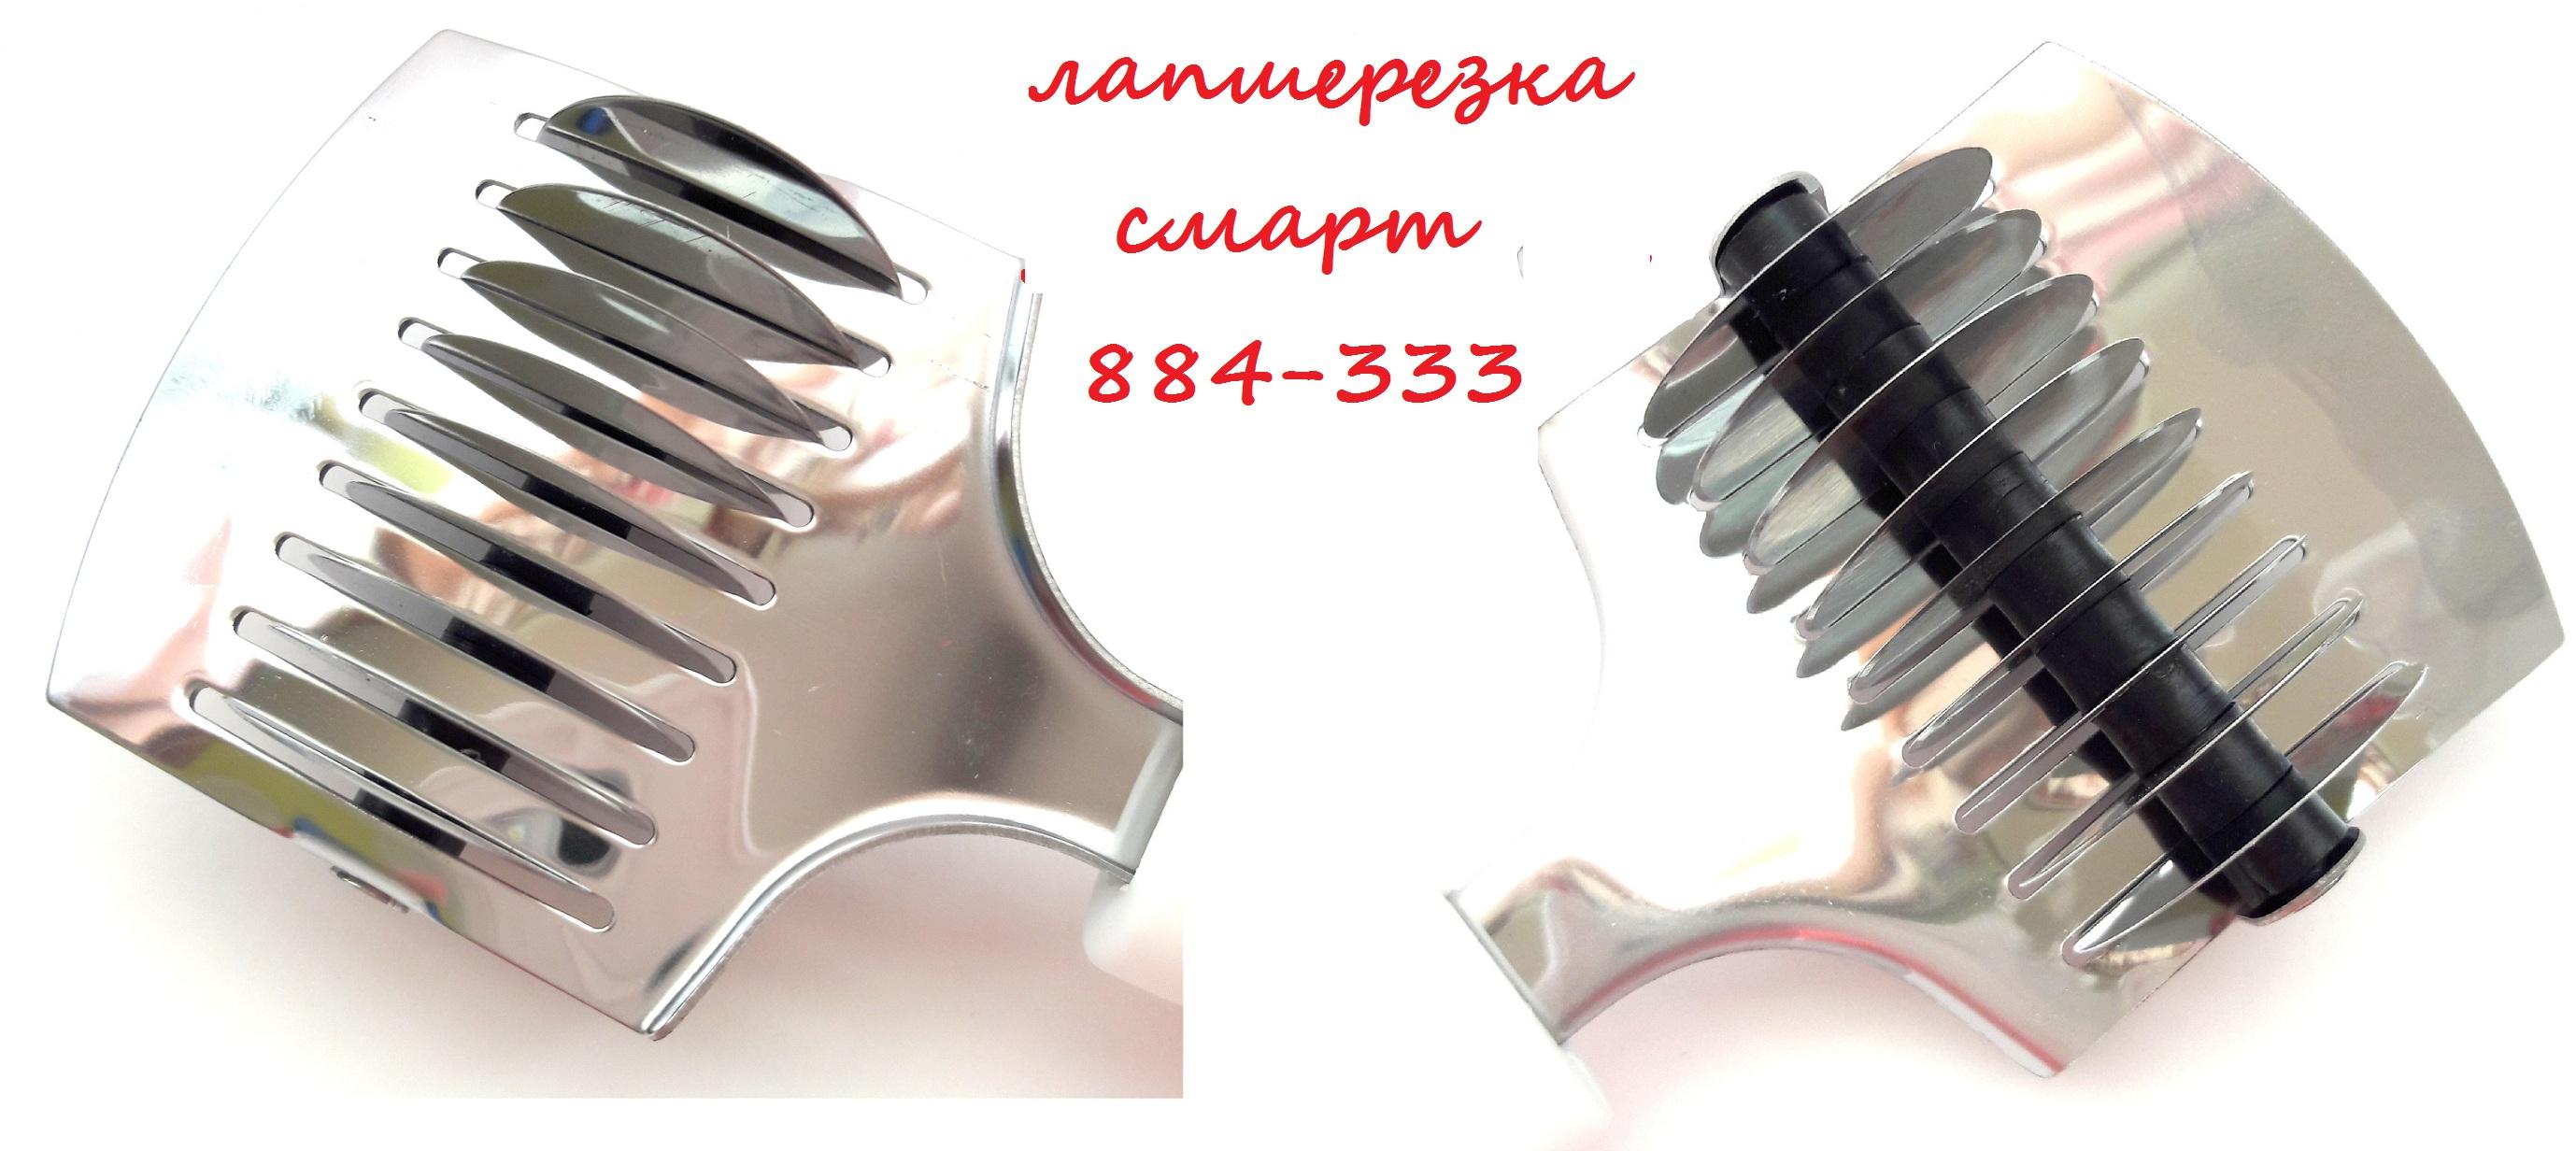 VETTA 884-333 Ролик лапшерезка